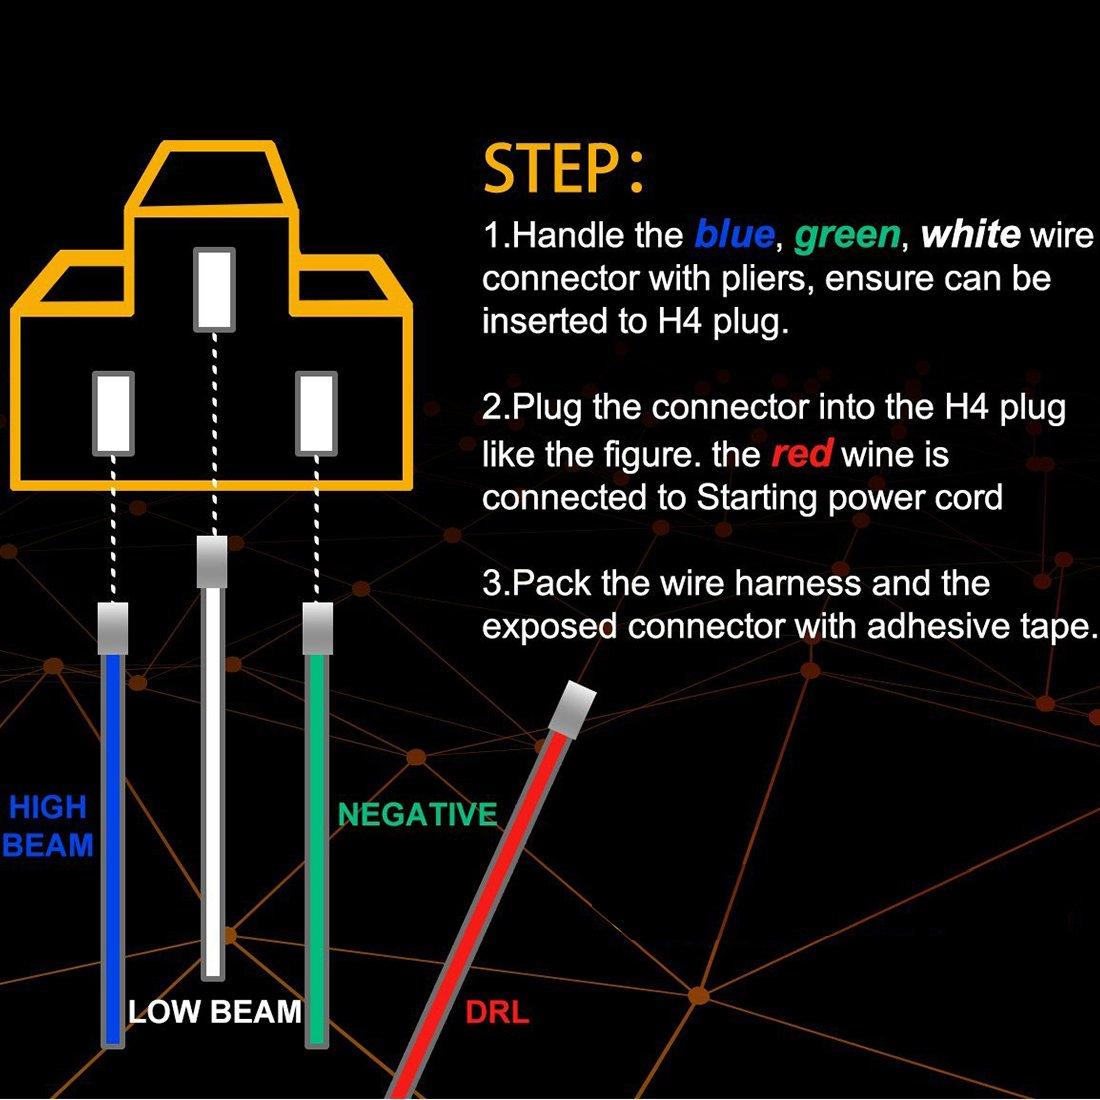 Rtd M02k Wiring Diagram - Somurich.com H Headlight Bulb Wiring Diagram on headlight relay wiring diagrams, headlight wiring diagram for a 93 toyota pickup, headlight switch wiring diagram, headlight socket wiring diagram,